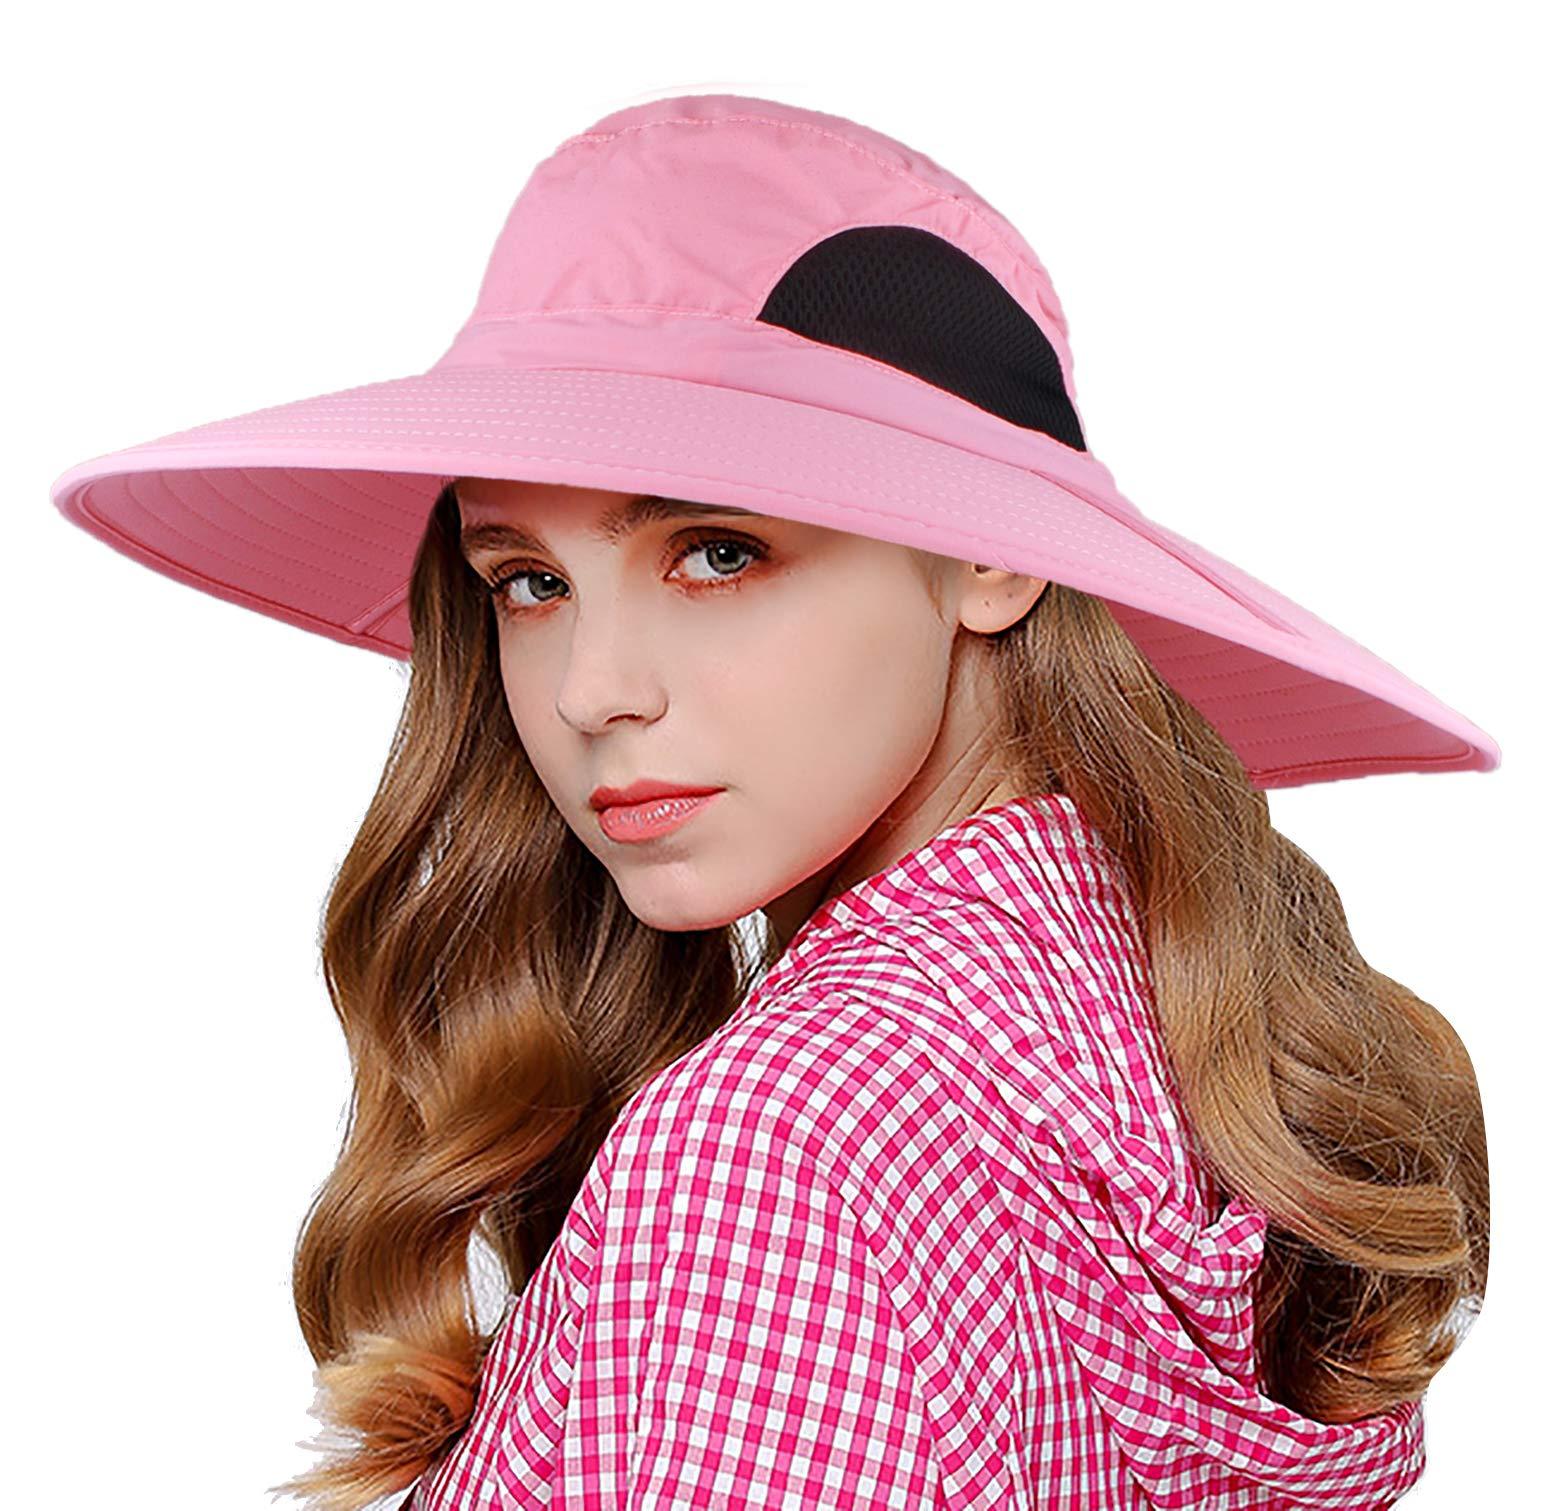 172edfa17cd EINSKEY Wide Brim Sun Hat Summer UV Protection Beach Hat Showerproof Safari  Boonie Hat Foldable Fishing